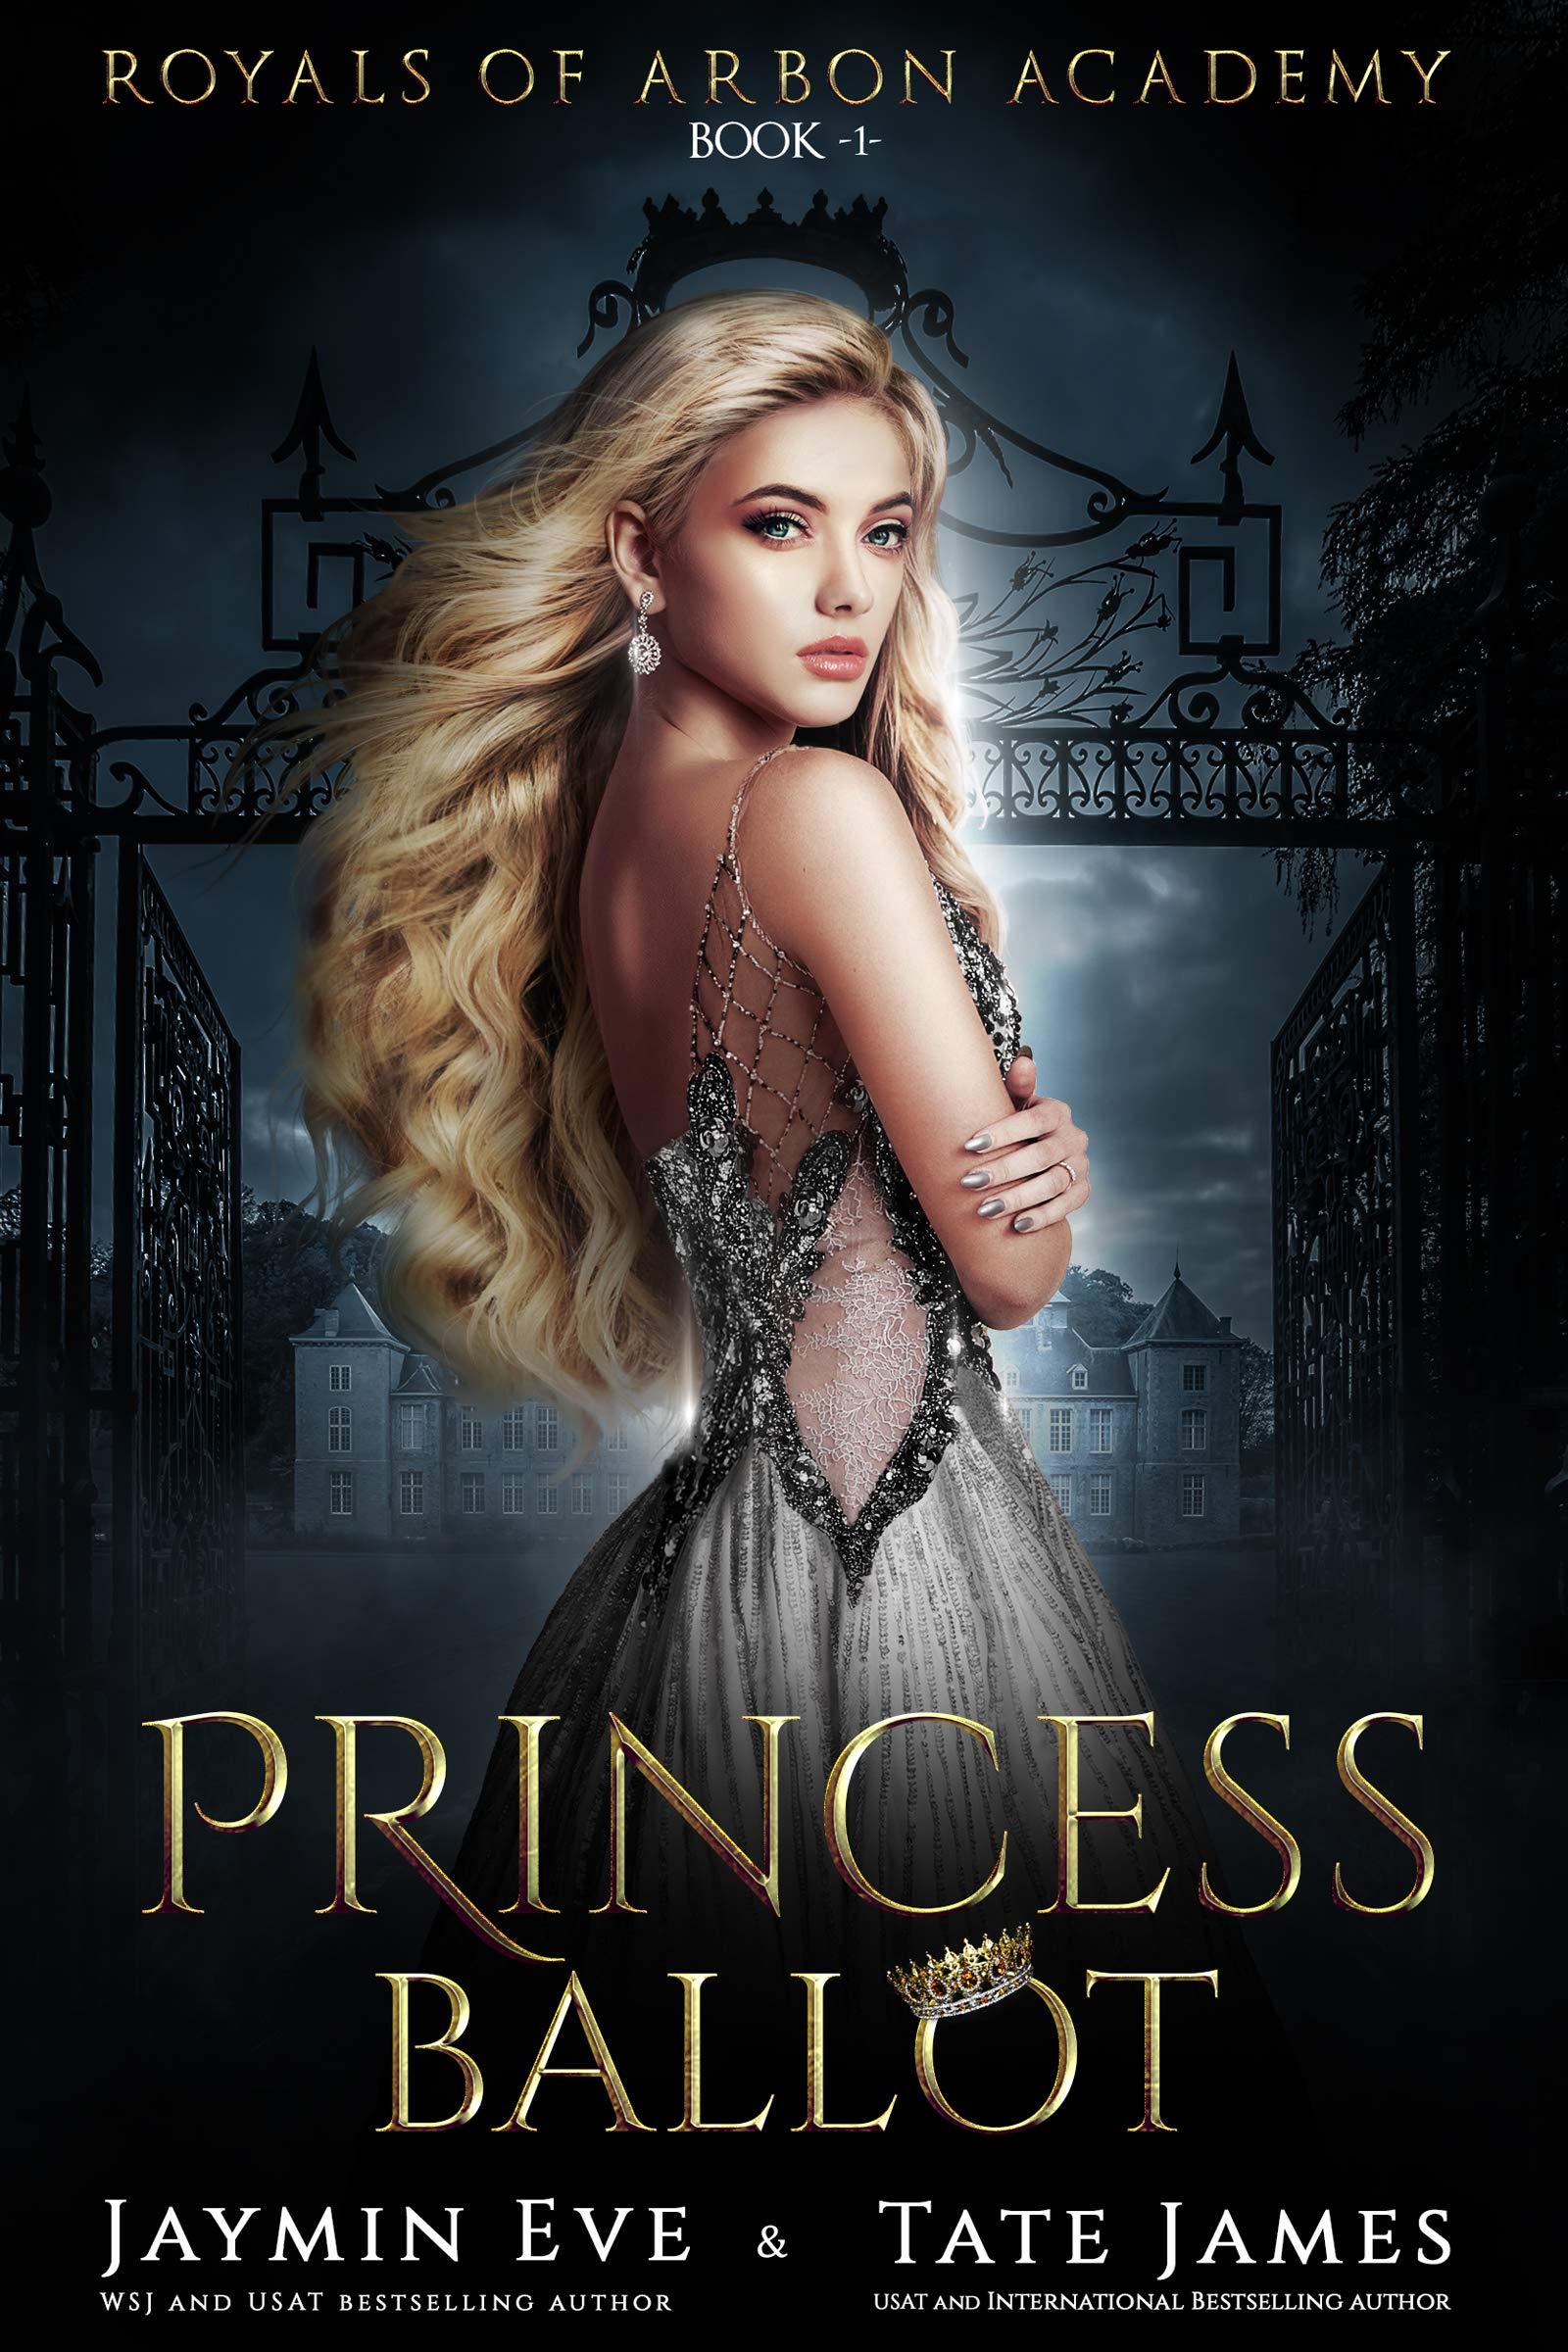 Princess Ballot: A Dark College Romance (Royals of Arbon Academy Book 1)